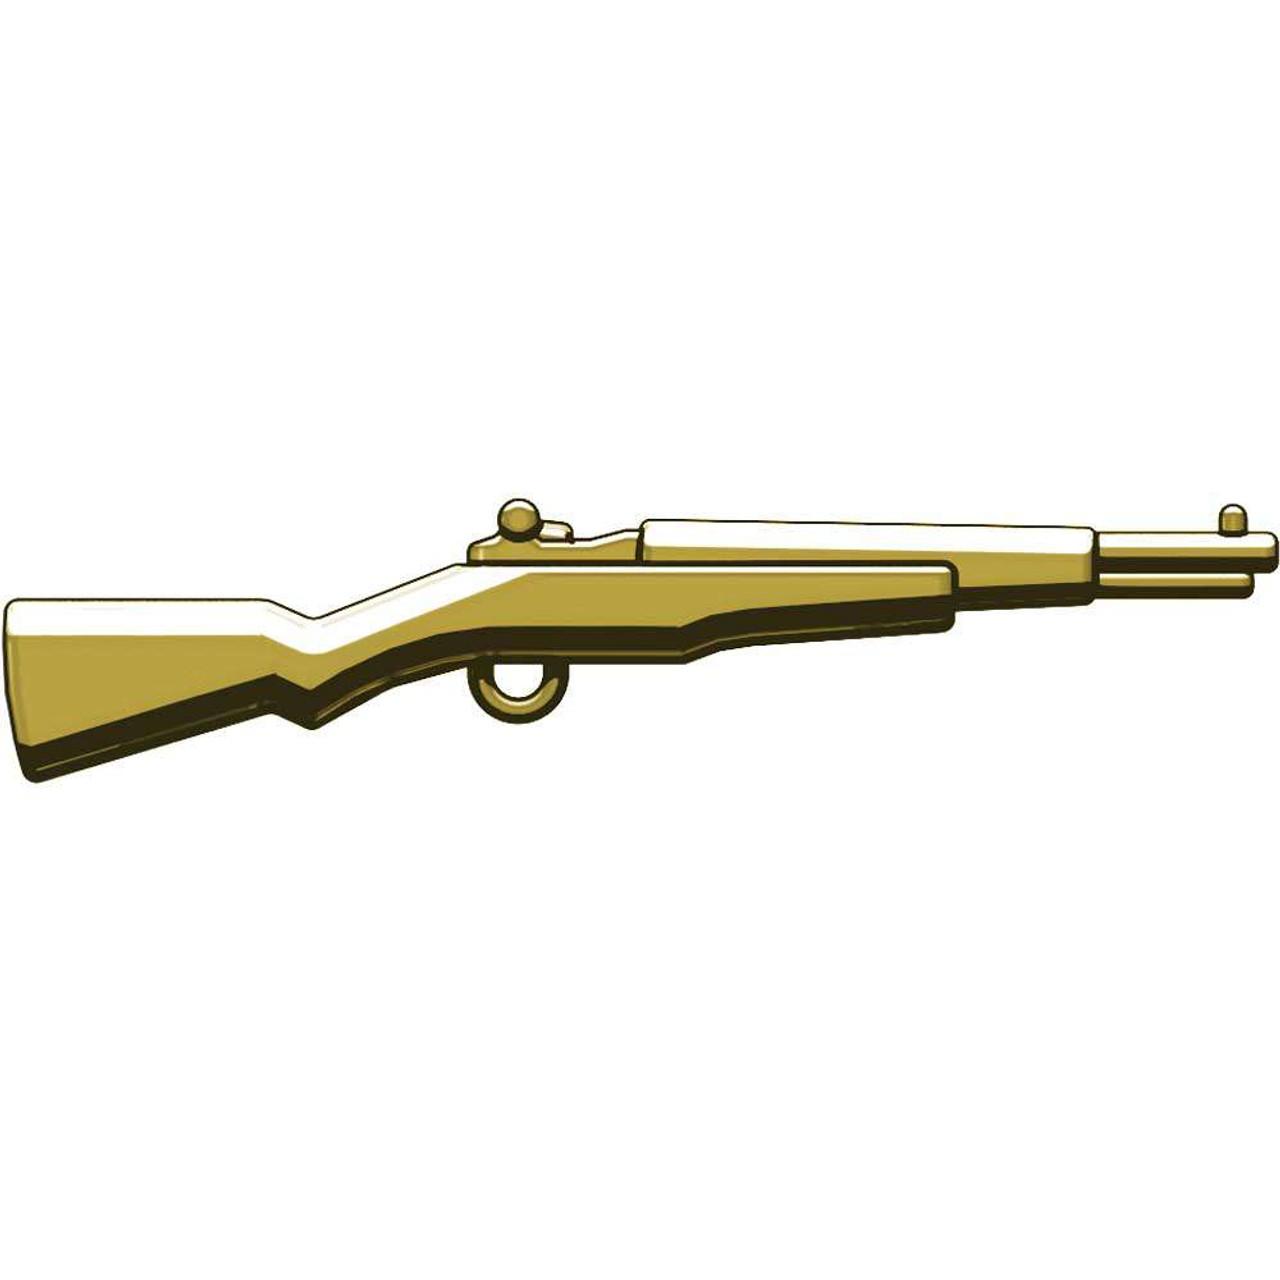 BrickArms Weapons M1 Garand WWII Rifle 2.5-Inch [Tan]